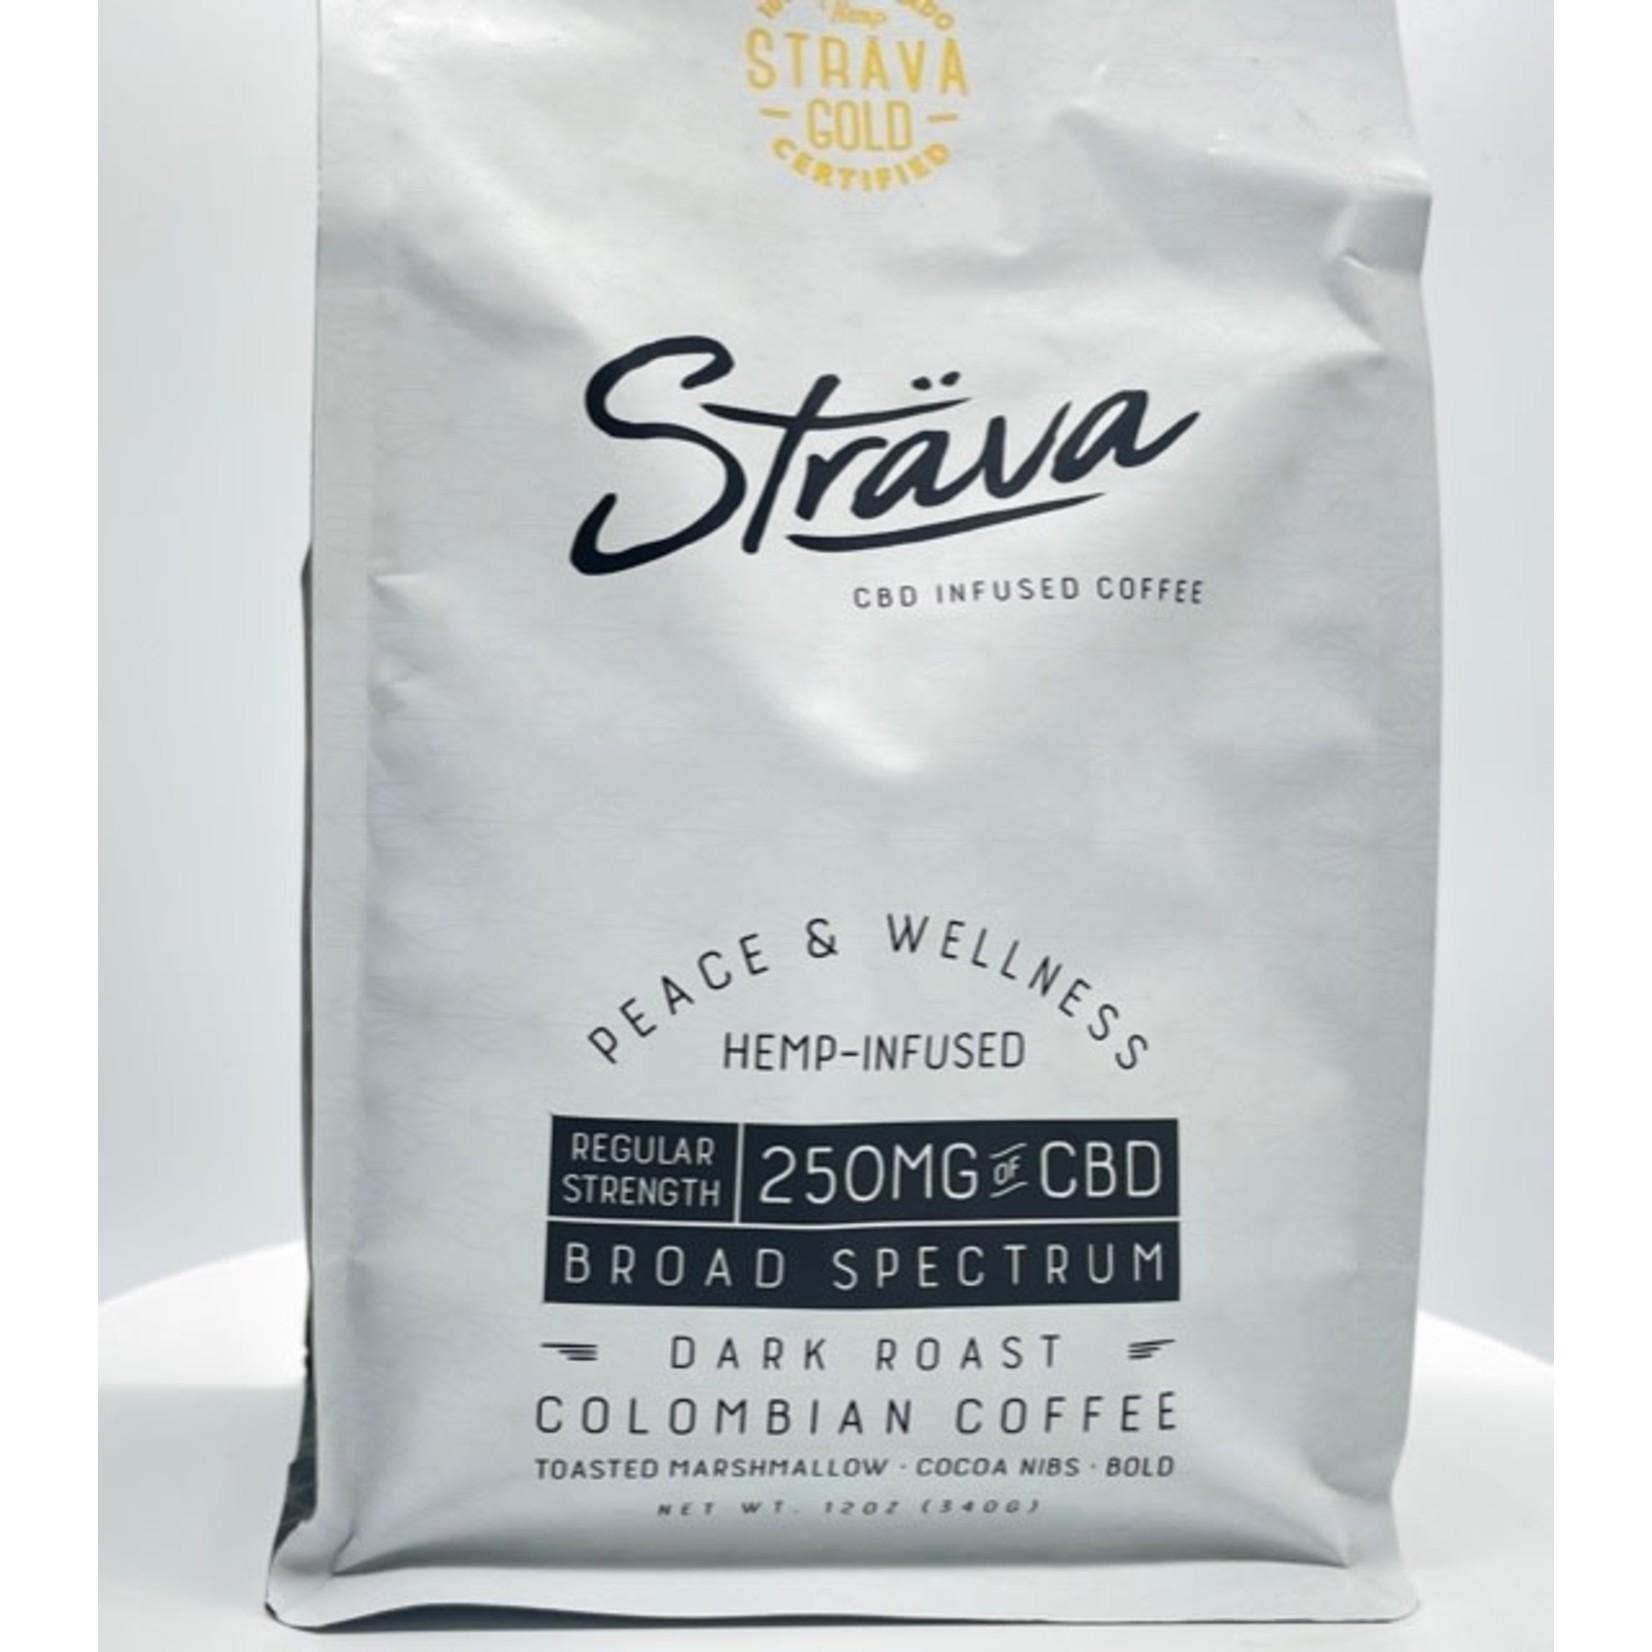 Strava Strava CBD Infused Coffee 250mg Broad Spectrum Dark Roast Regular Strength